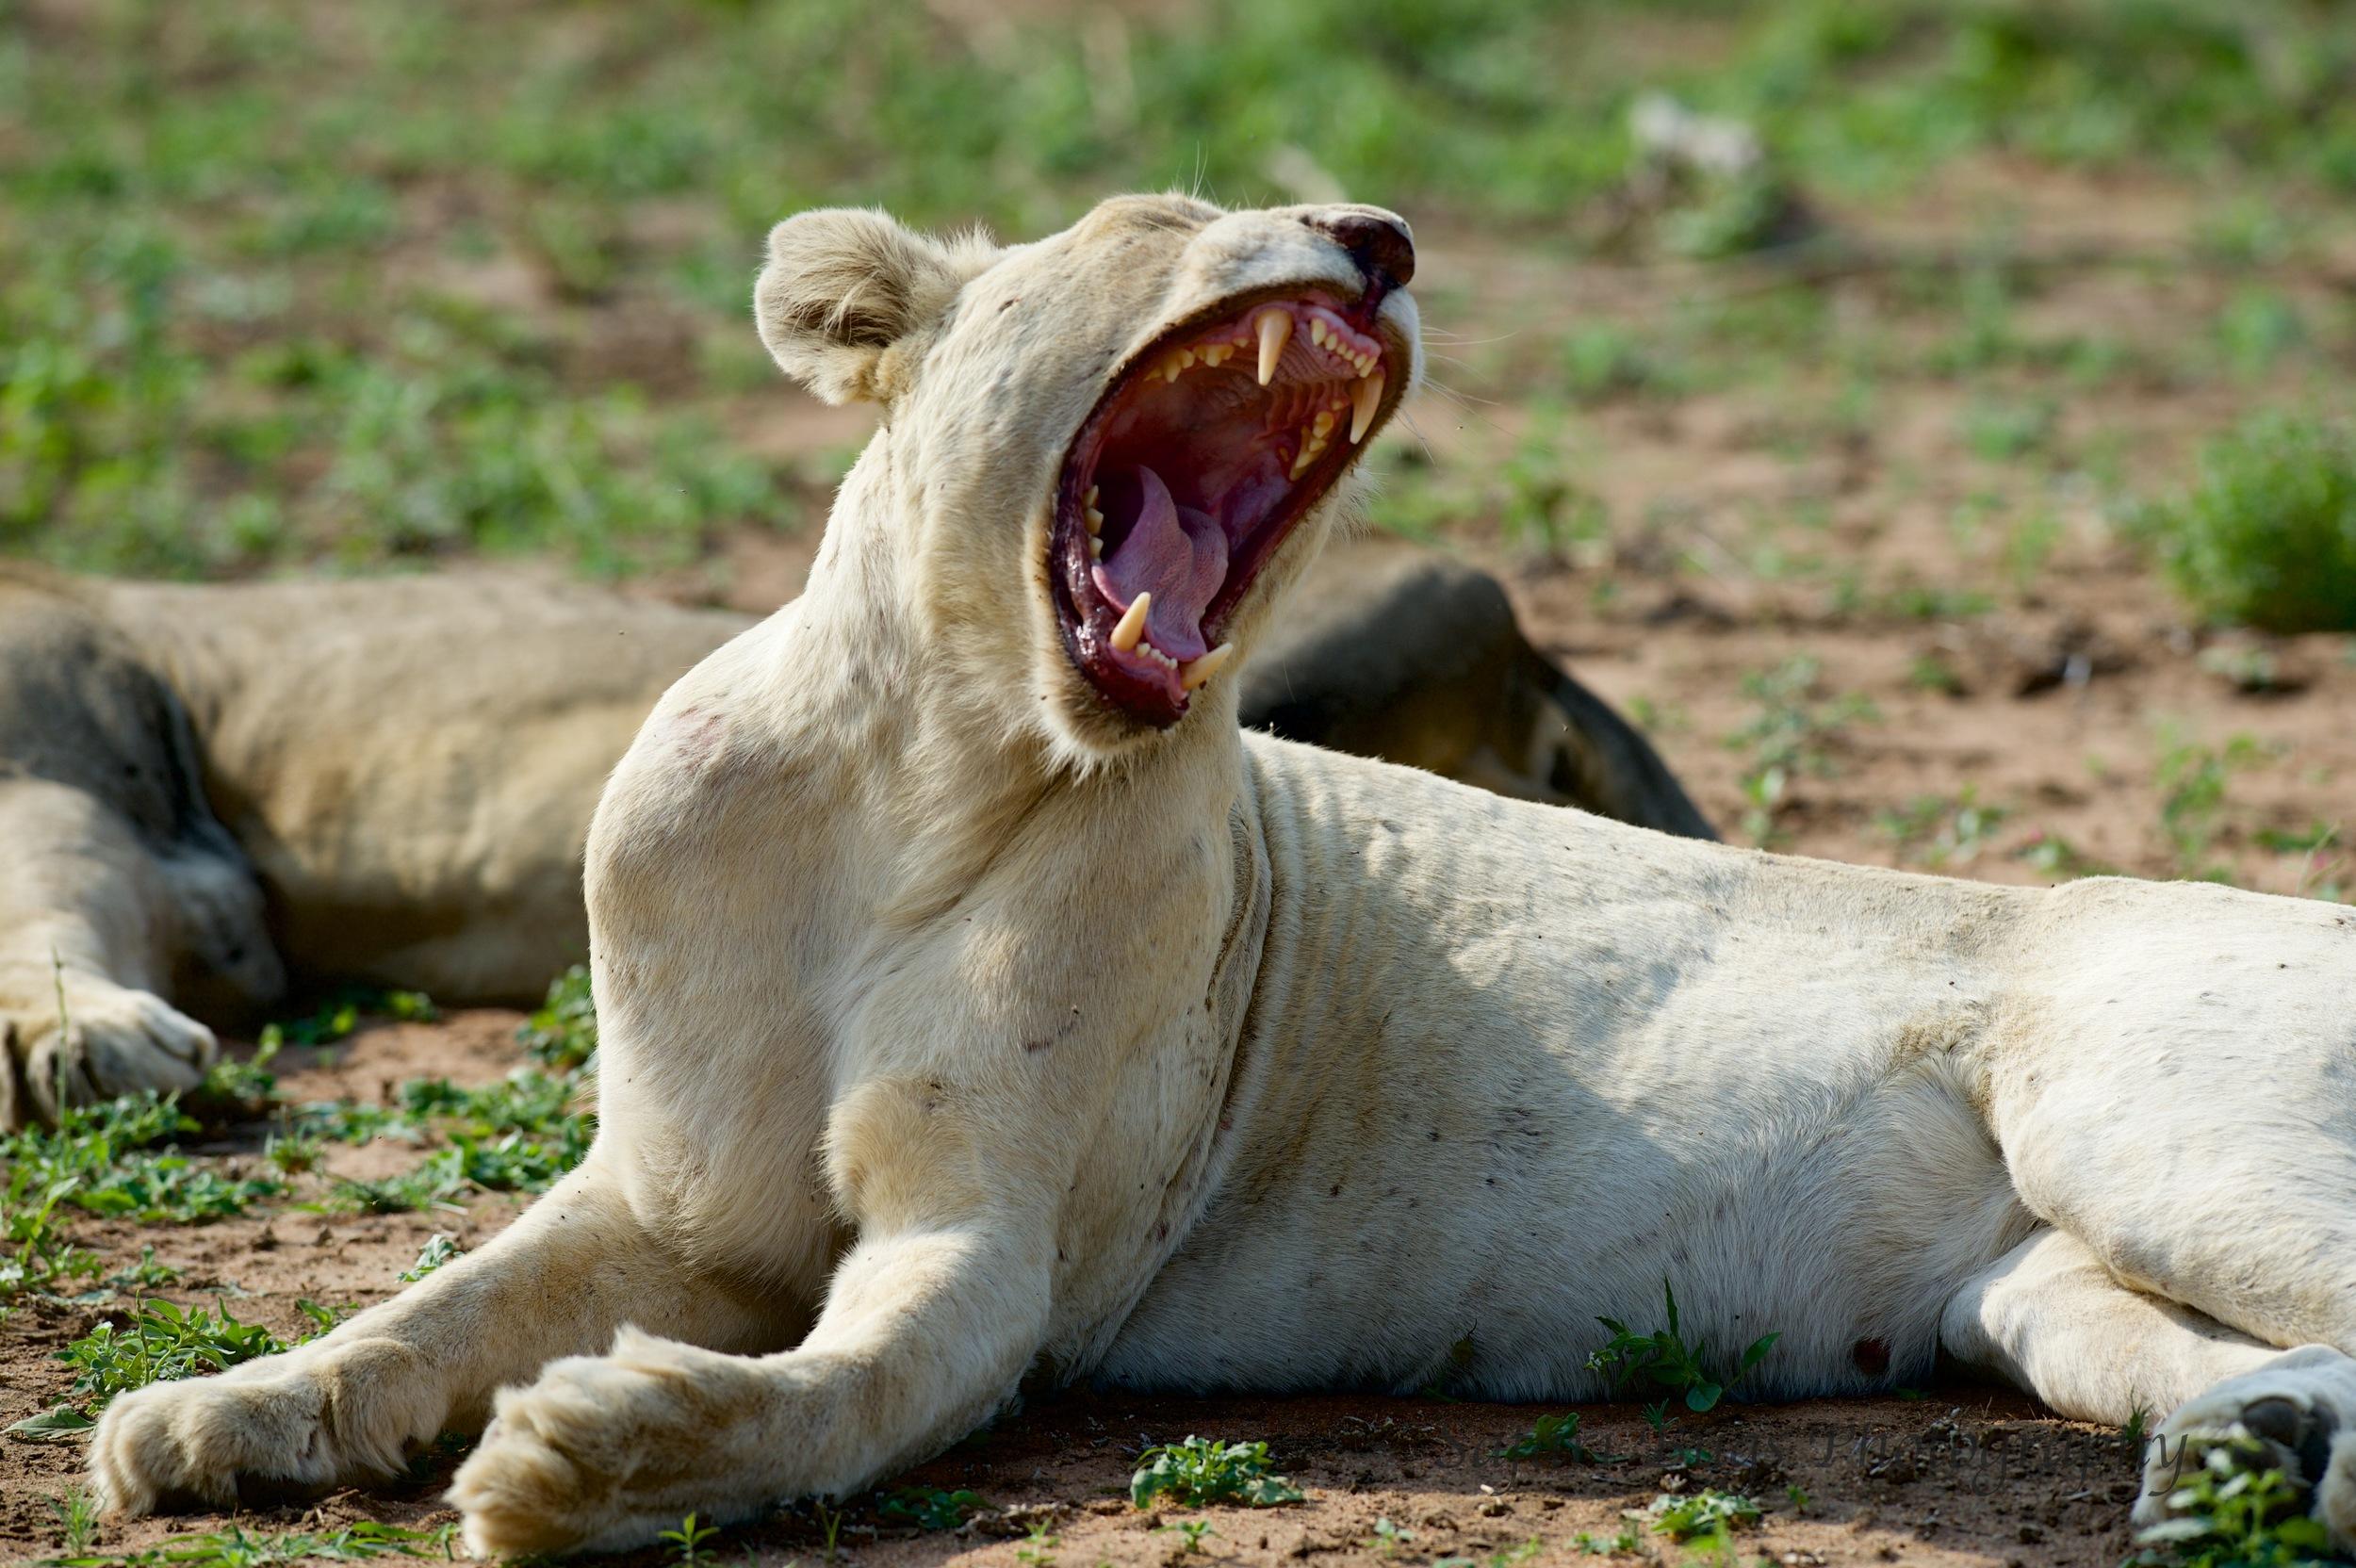 White Lioness Yawning